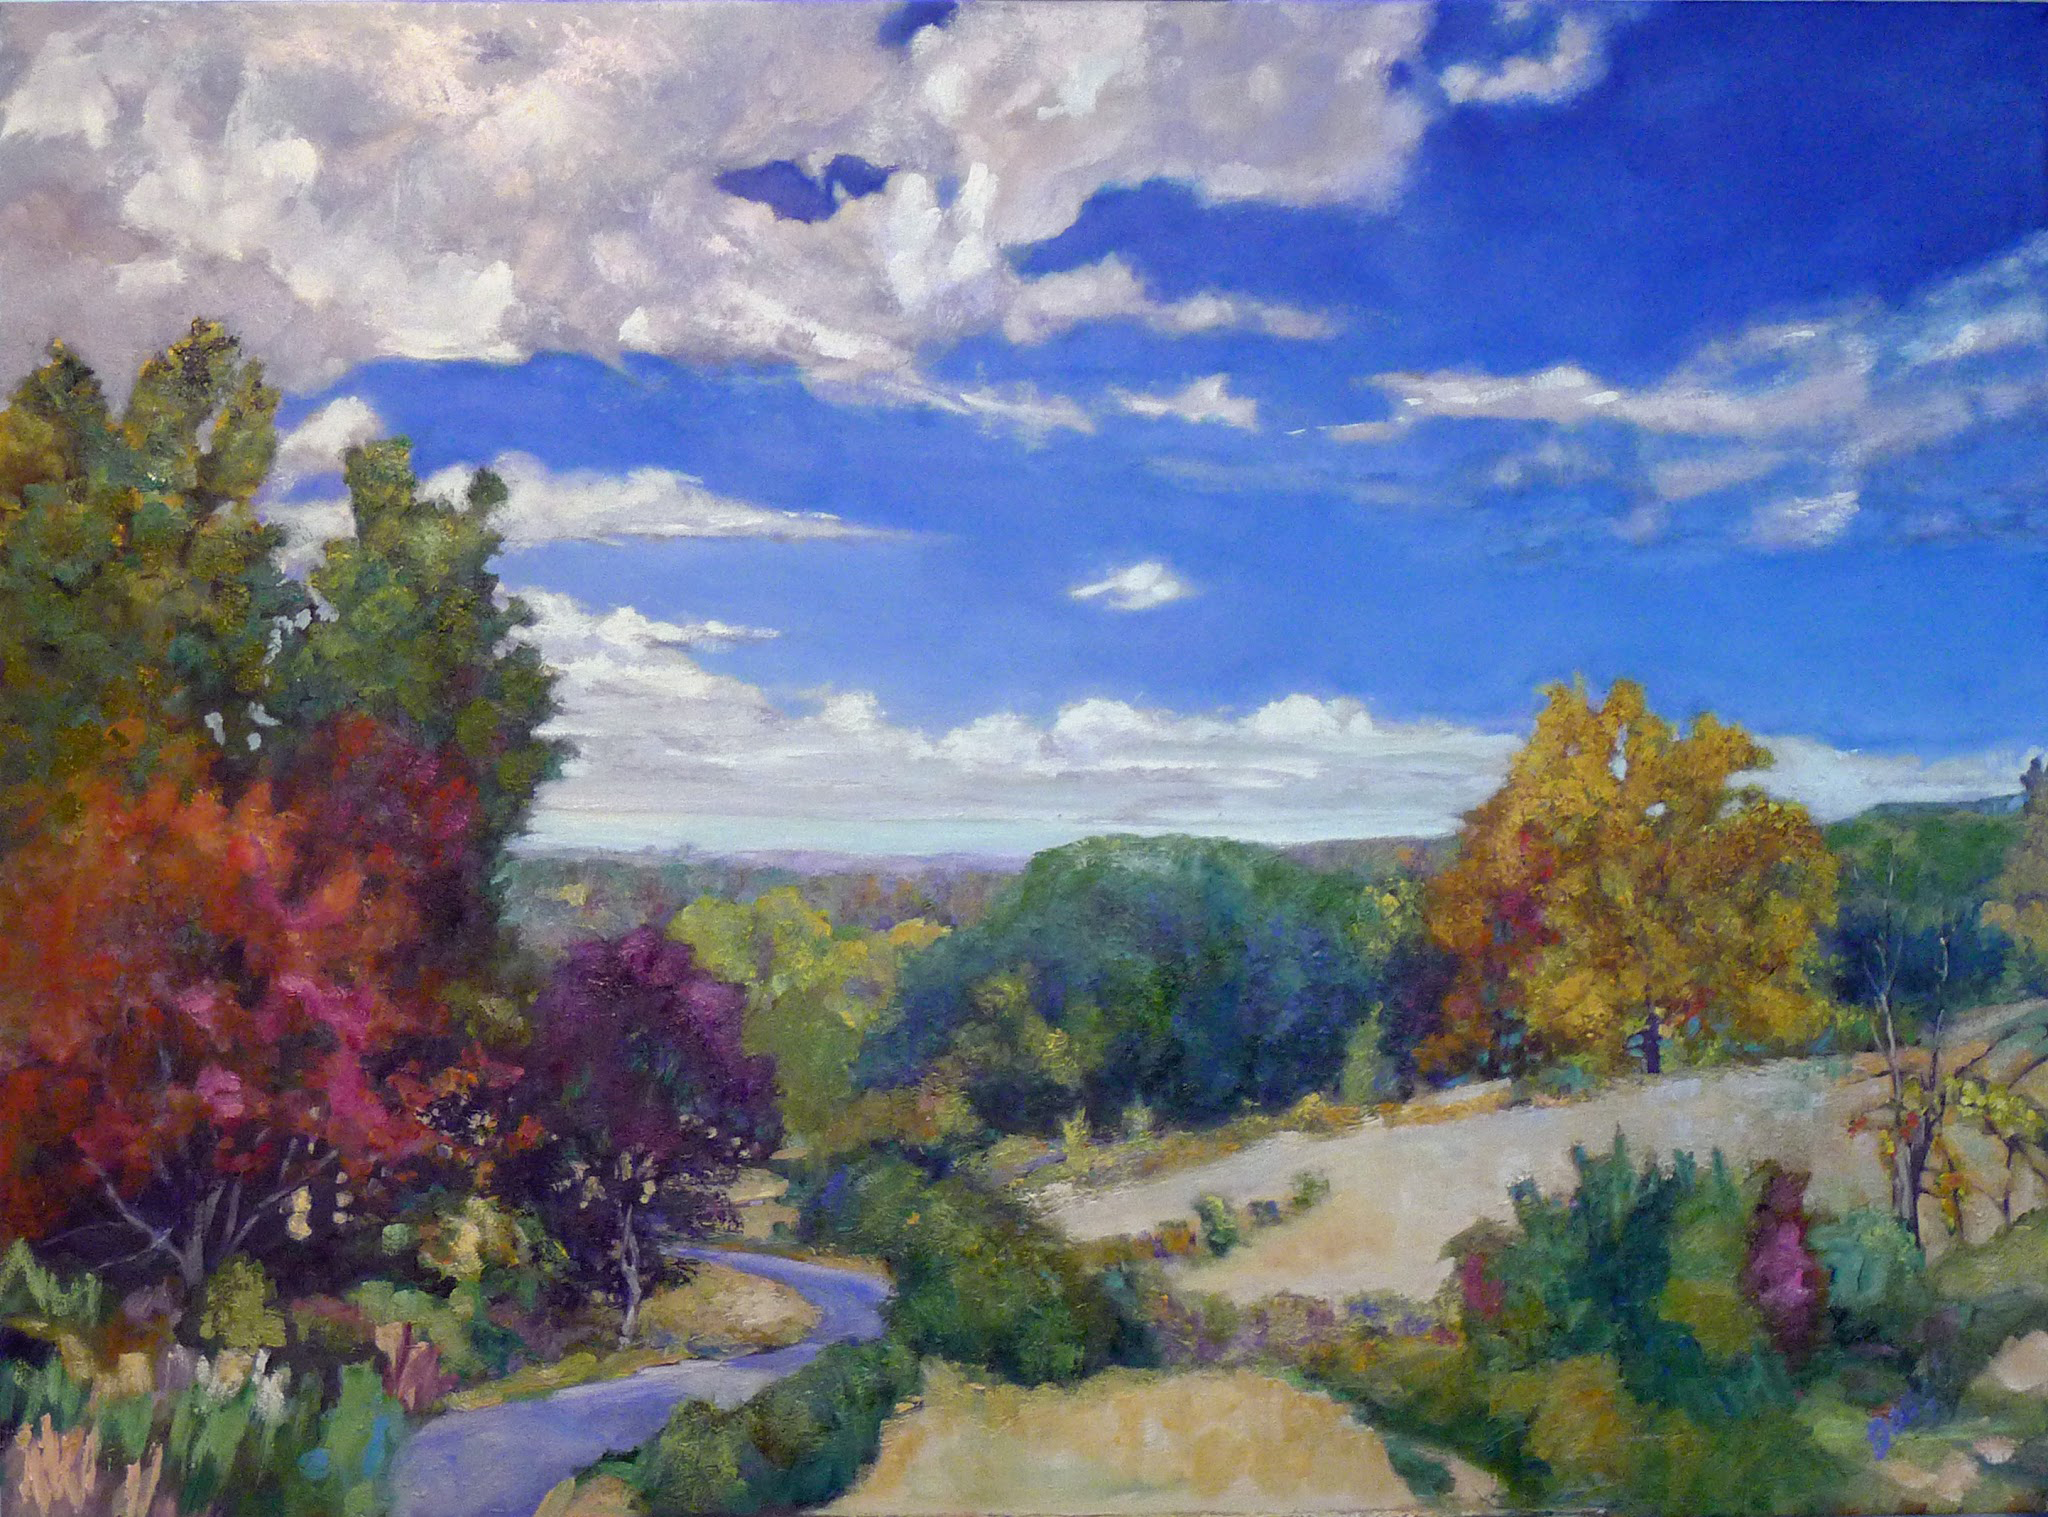 """Midsummer reverie,"" 30X40, oil on canvas."